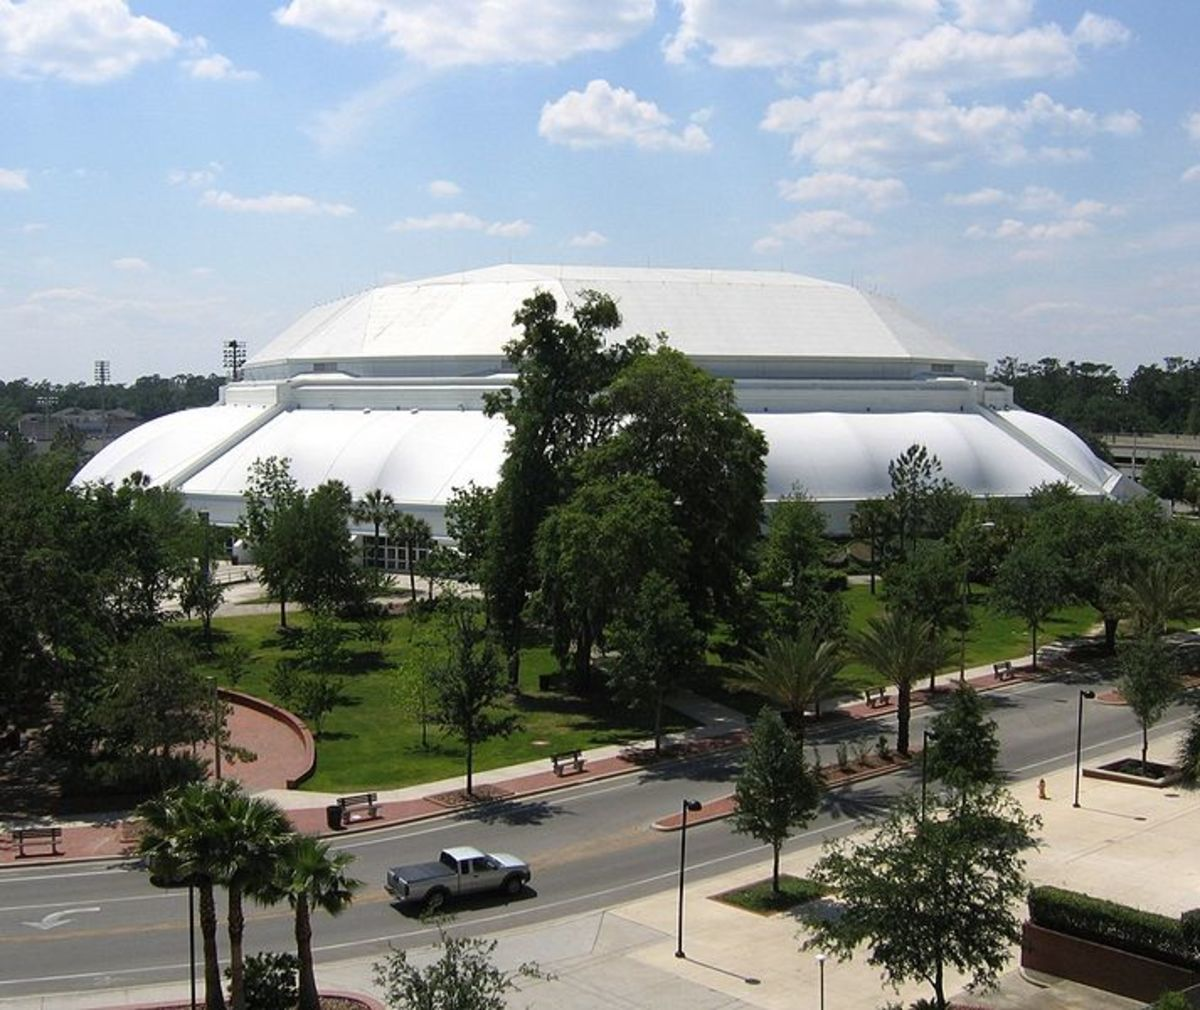 The O'dome